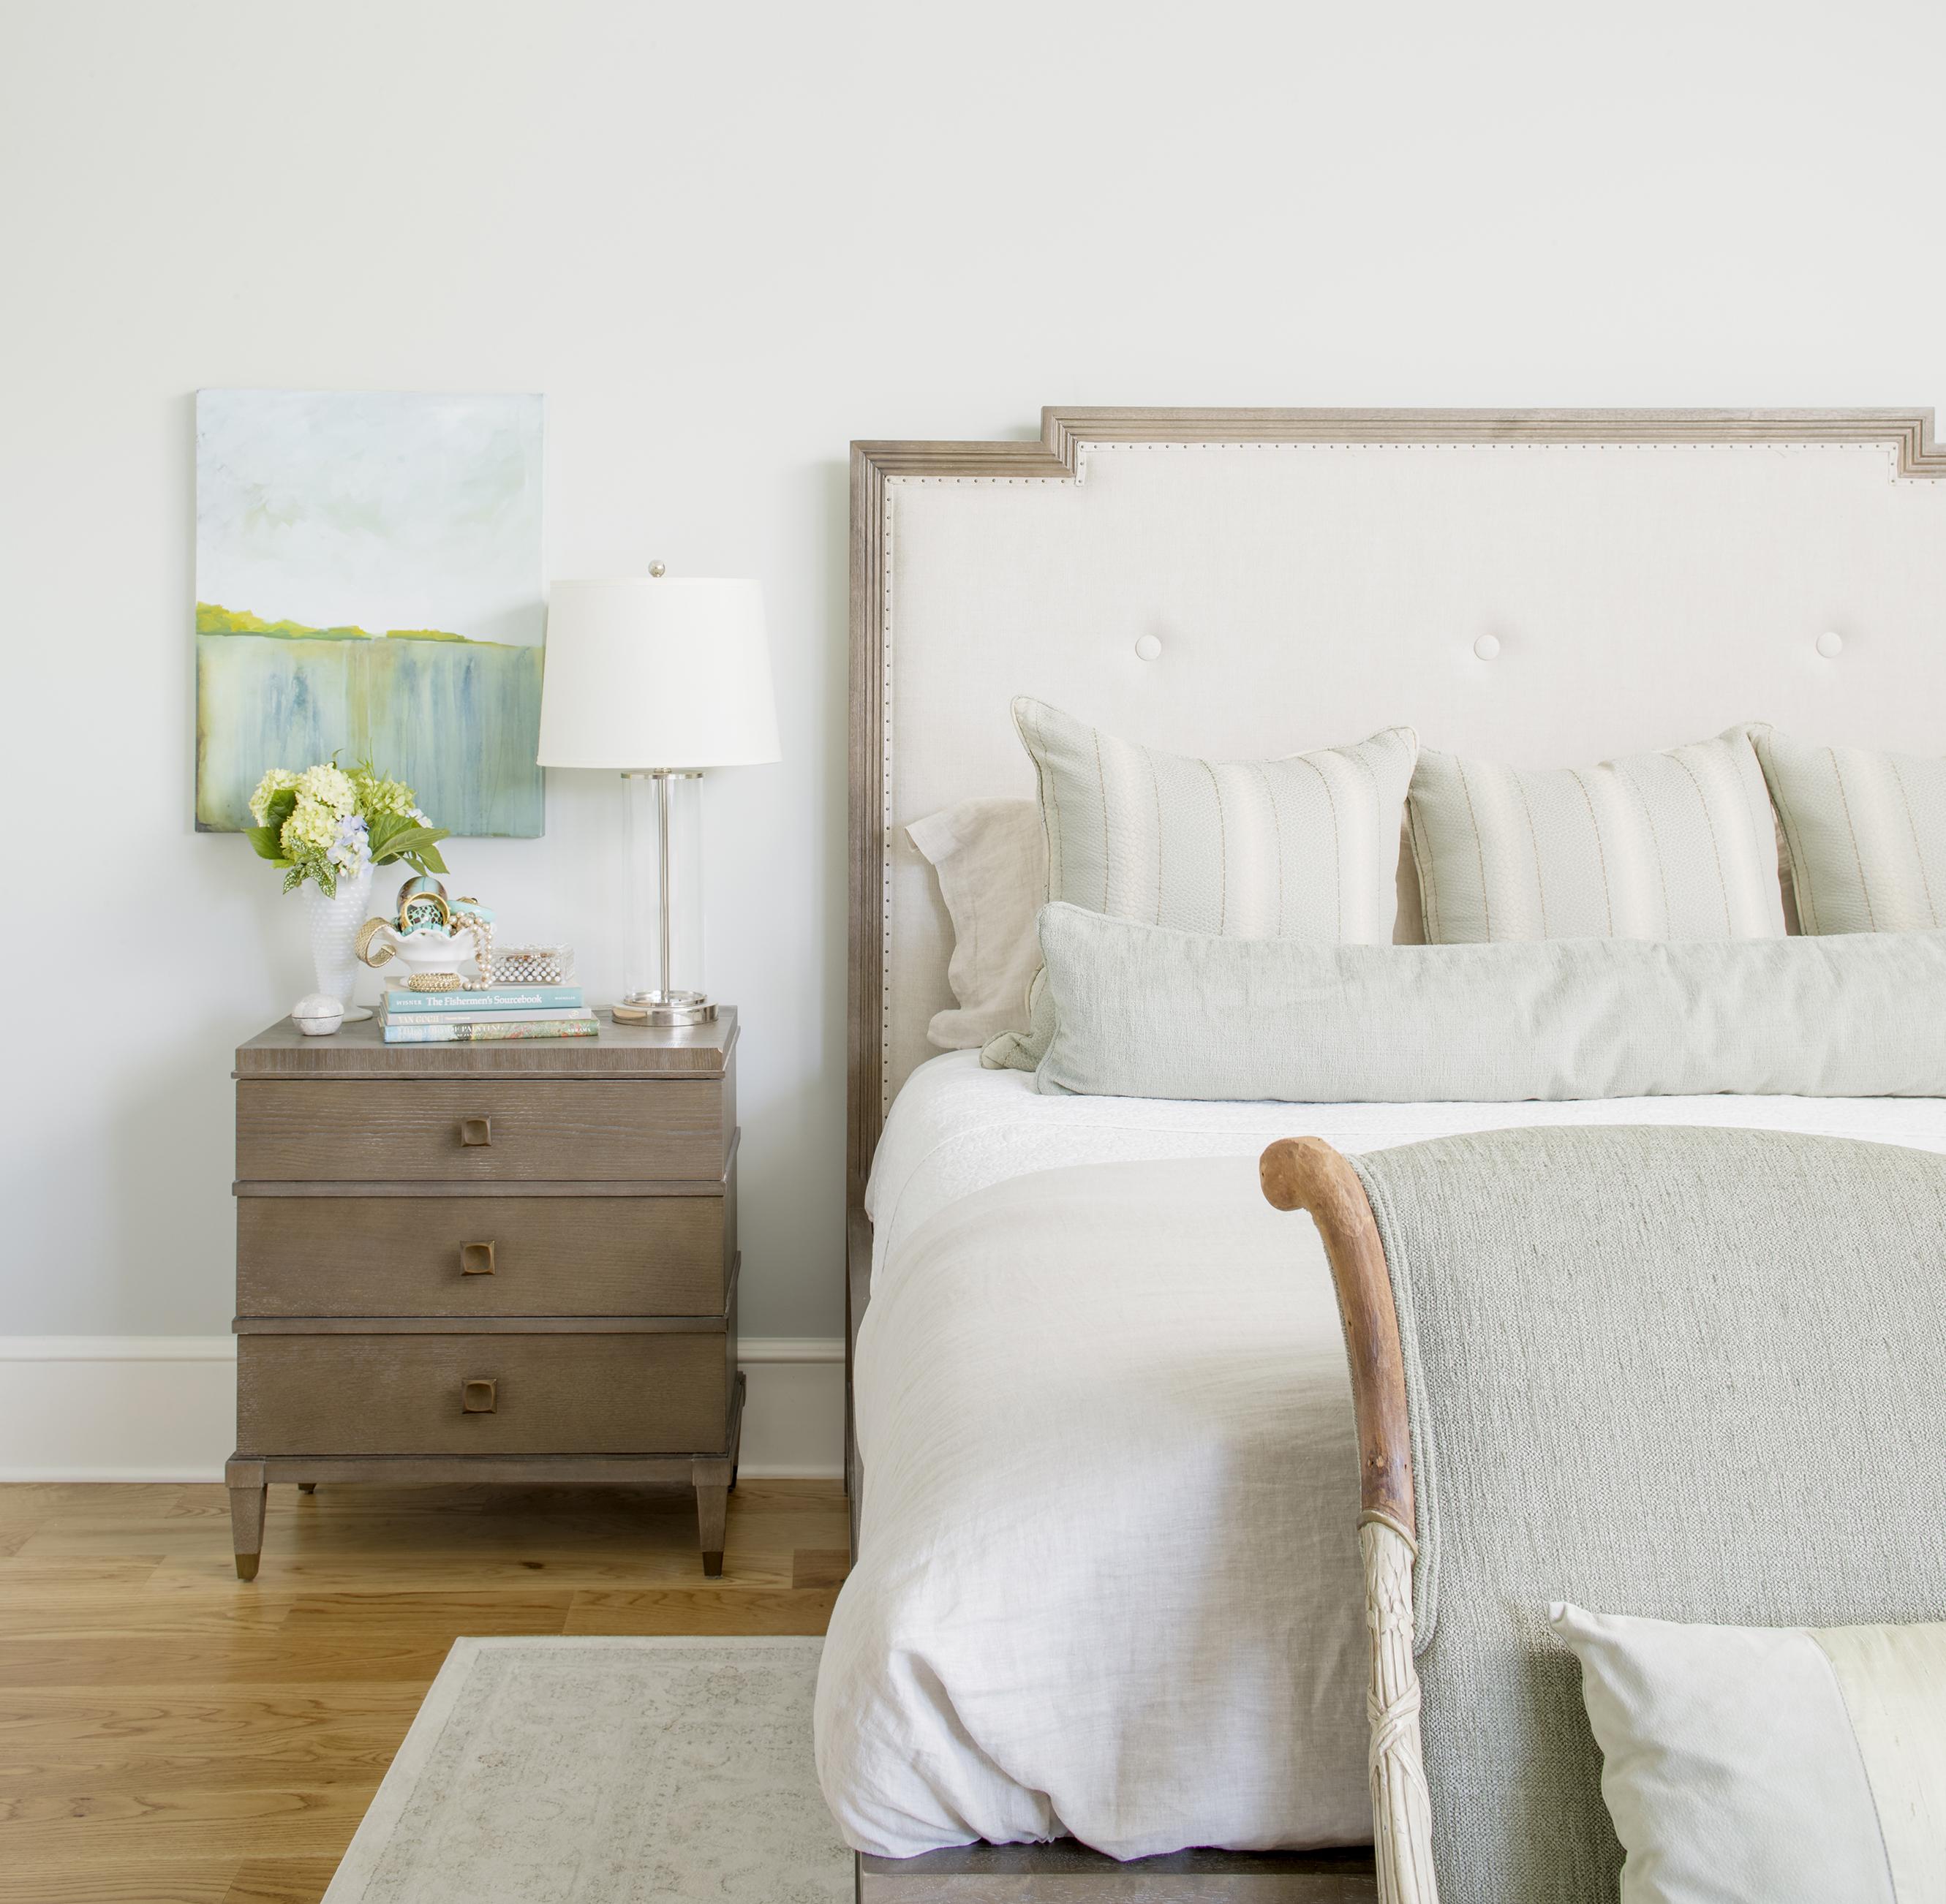 Bedroom. Photo by Beau Kester